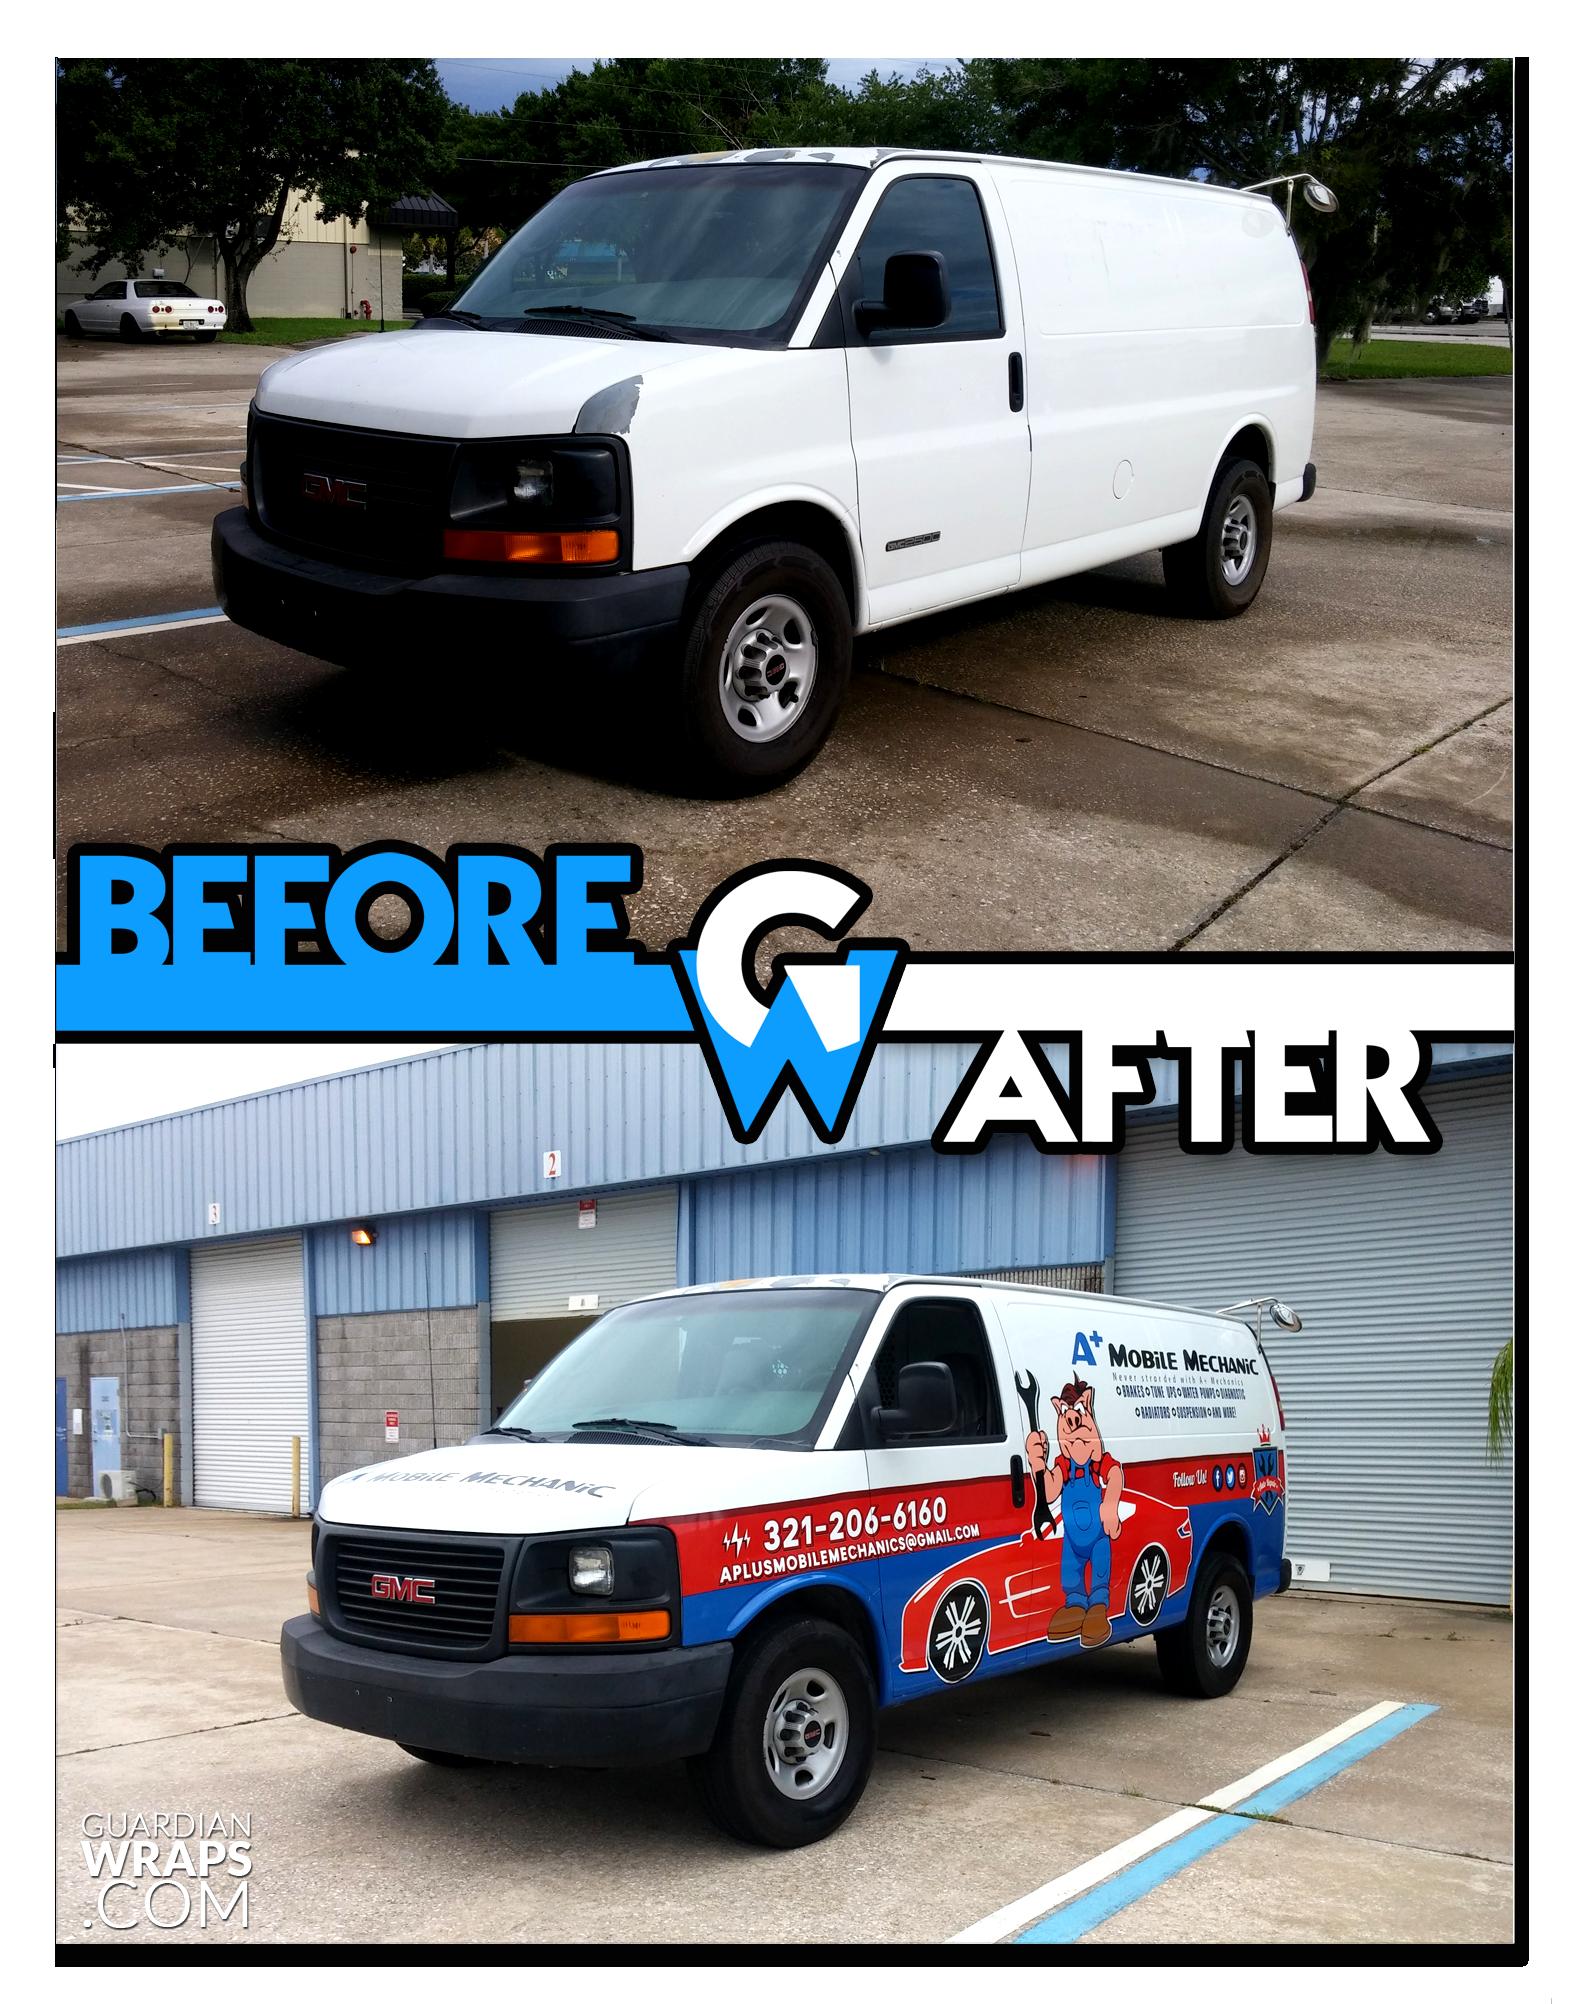 A Mobile Mechanics Business Van Custom Vinyl Wrap Guardian Wraps Before And After